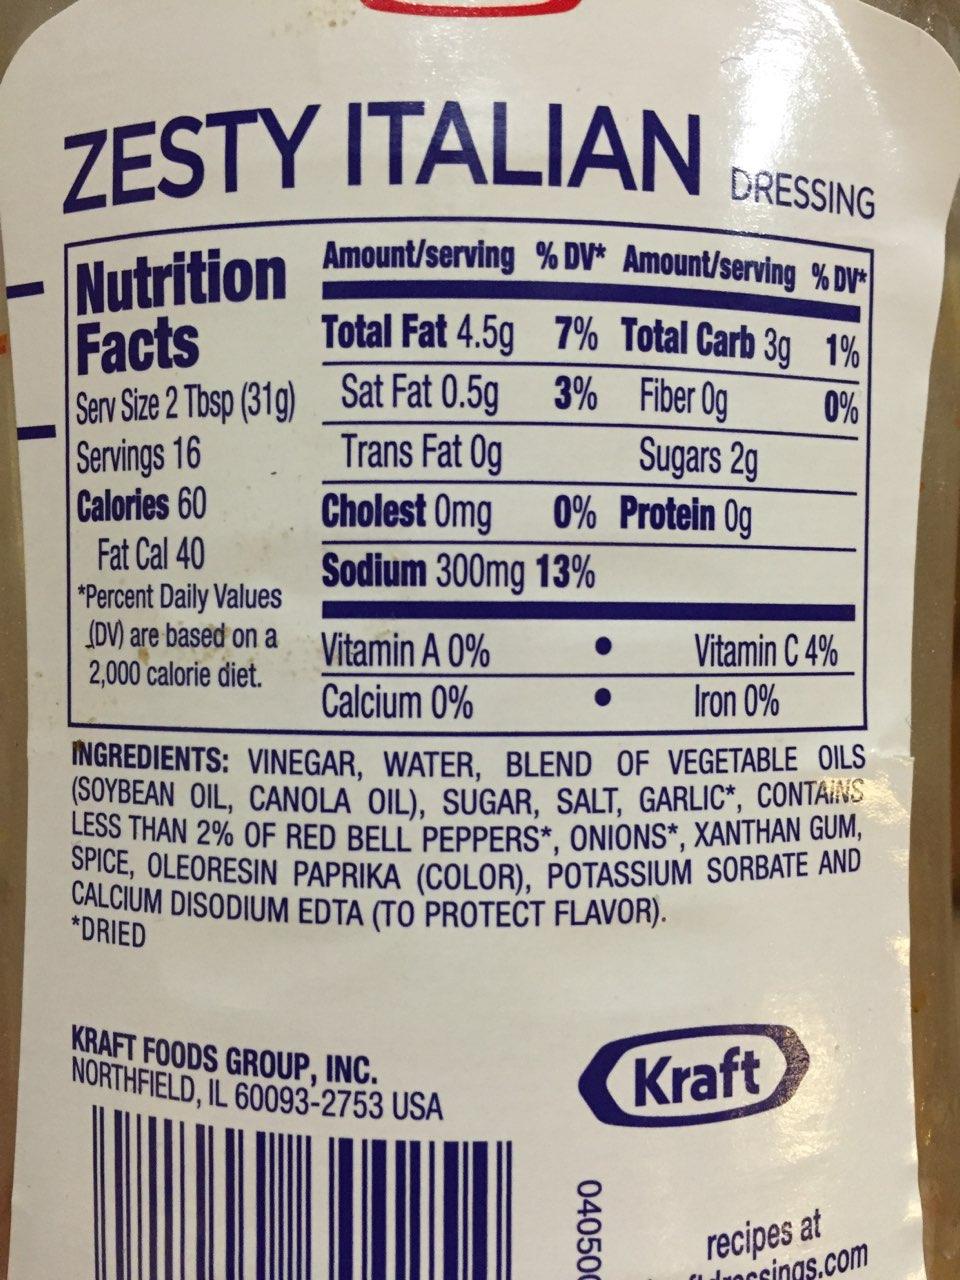 Kraft Dressing, Zesty Italian: Calories